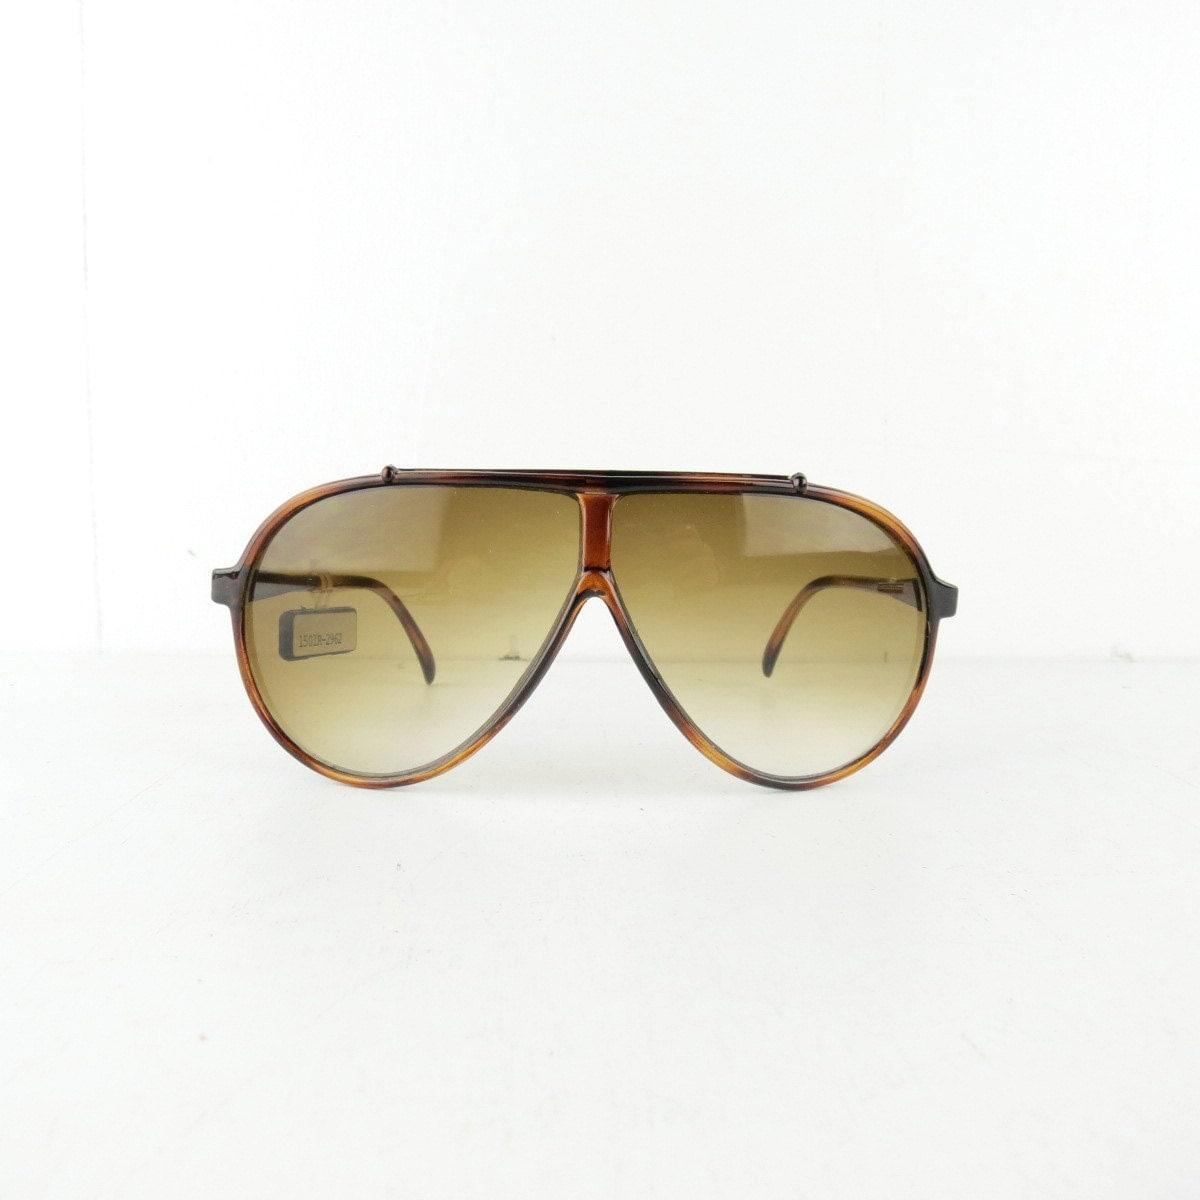 70s vintage aviator tortoise shell style acrylic sunglasses